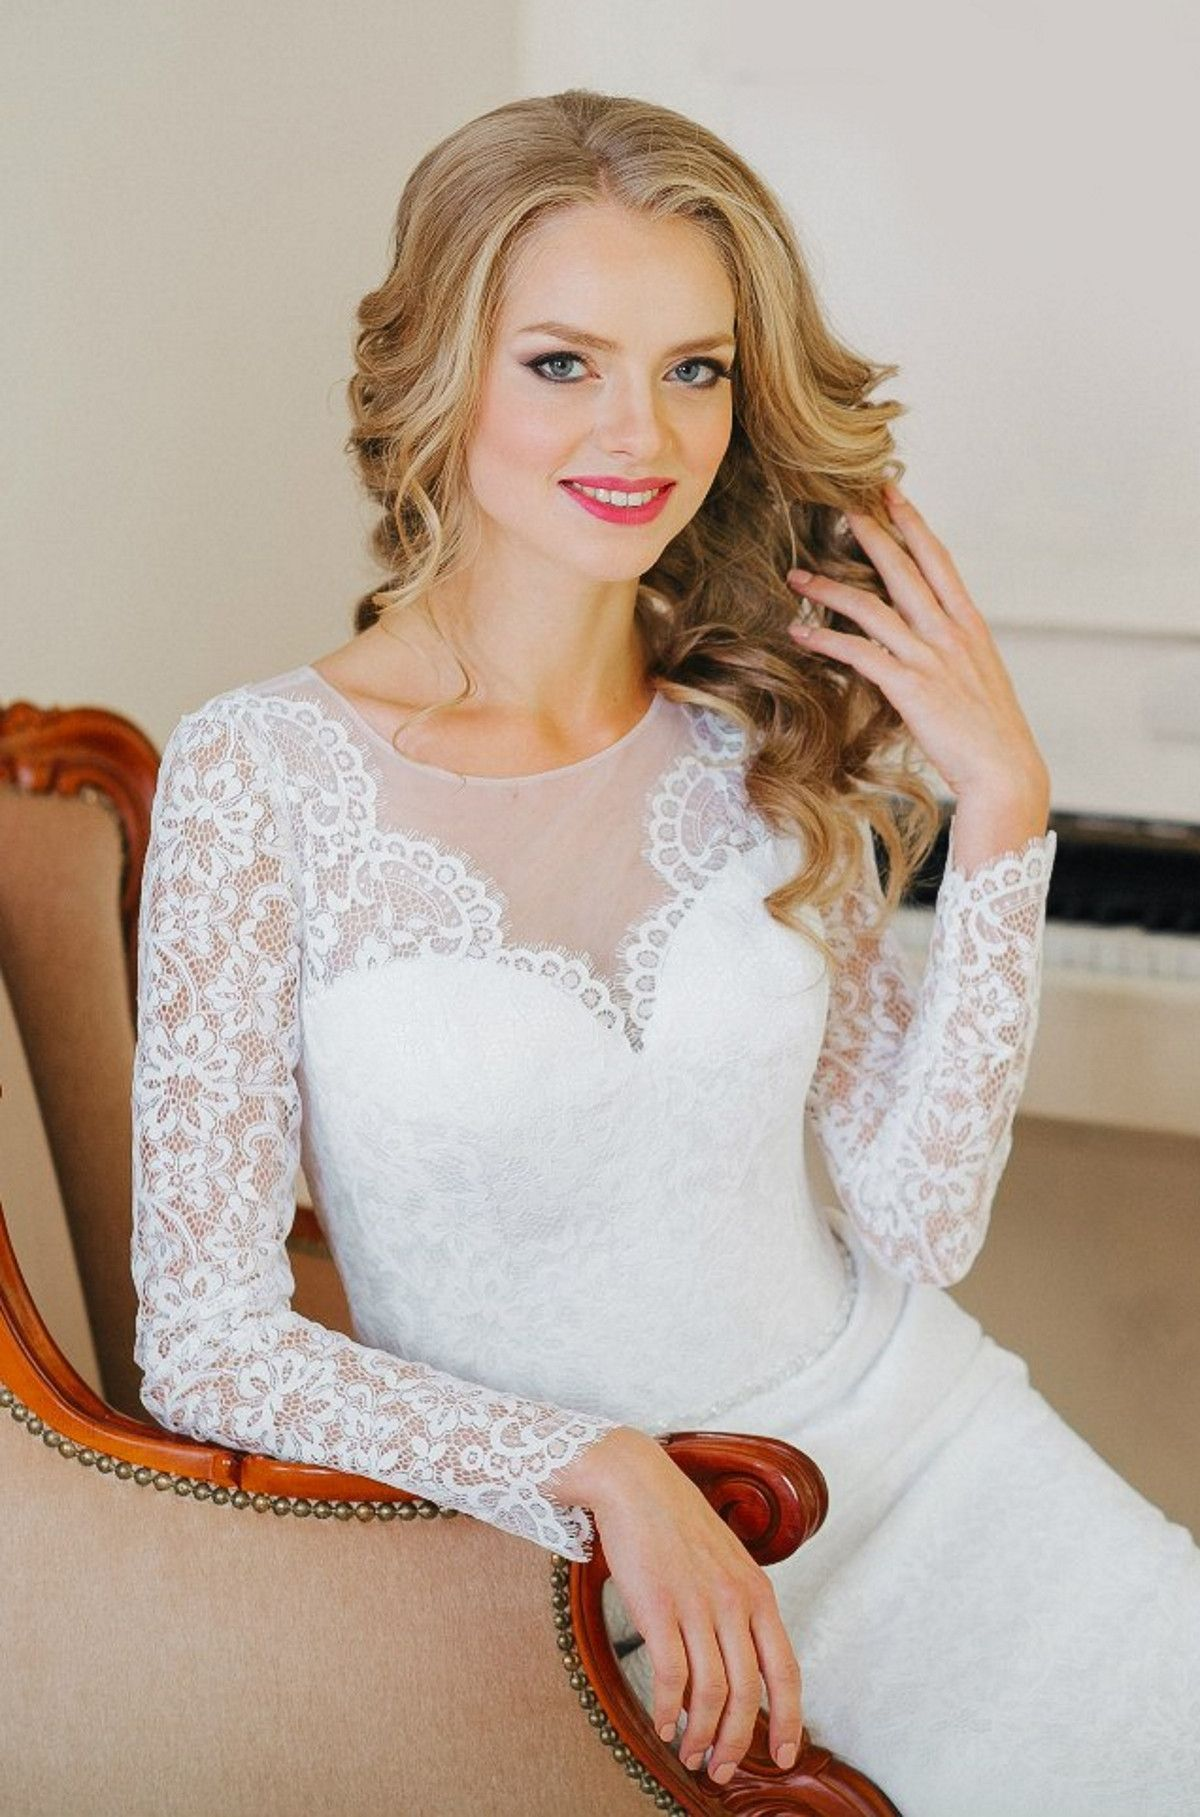 Alice in wonderland themed wedding dress  Dresses  Vintage Long Sleeved Lace Aline Long Wedding Dress   My